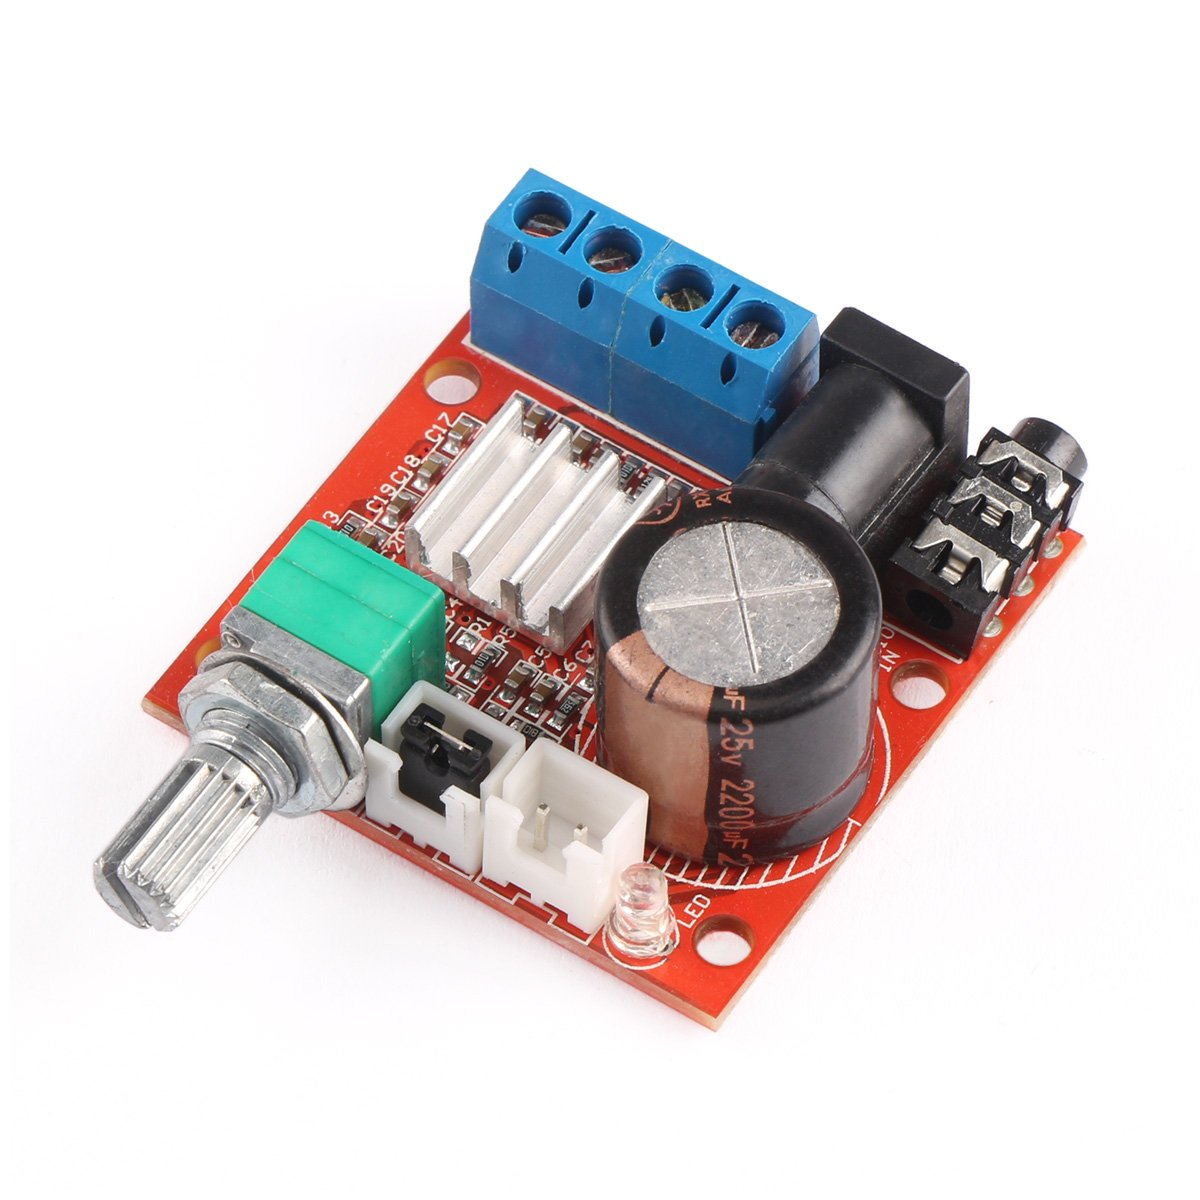 Cheap Diy Amplifier Circuit Find Deals On Channels Subwoofer Stereo Audio Power Kit Board Get Quotations 12 Volt Drok Pam8610 Mini Amp 10w Digital Amplify